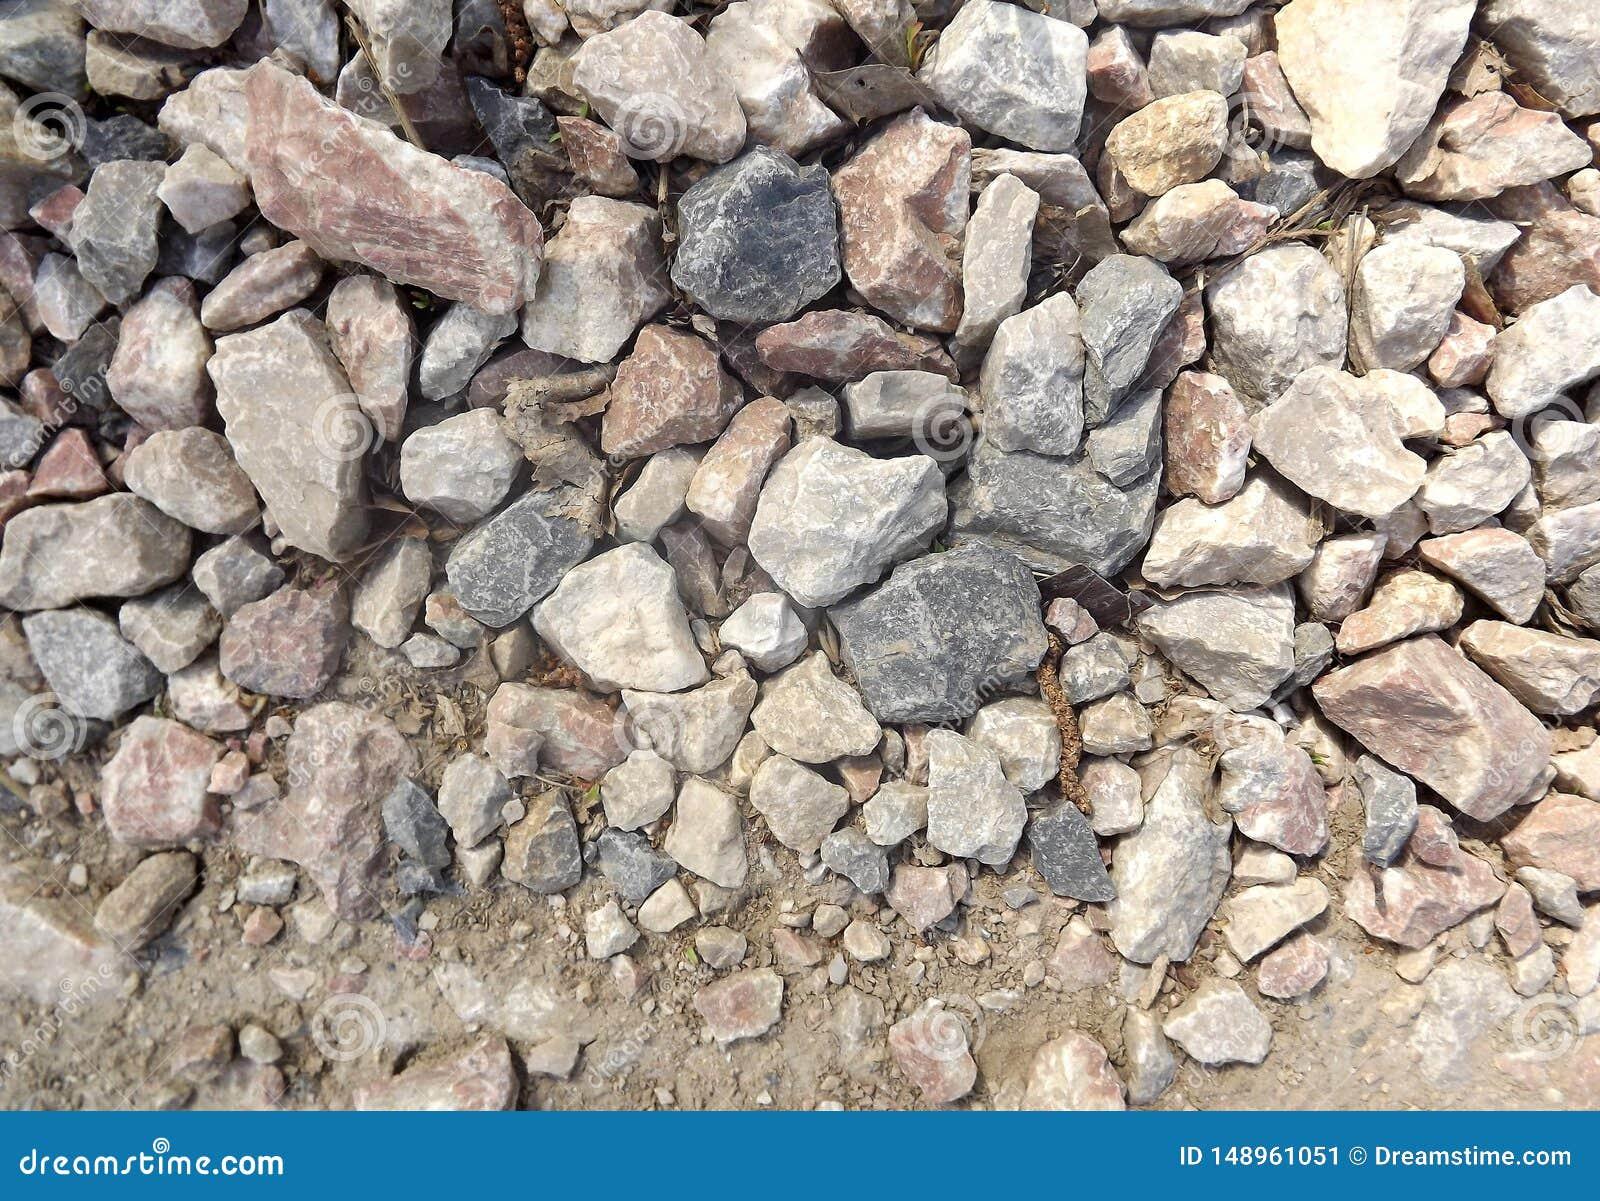 The road of granite stone.